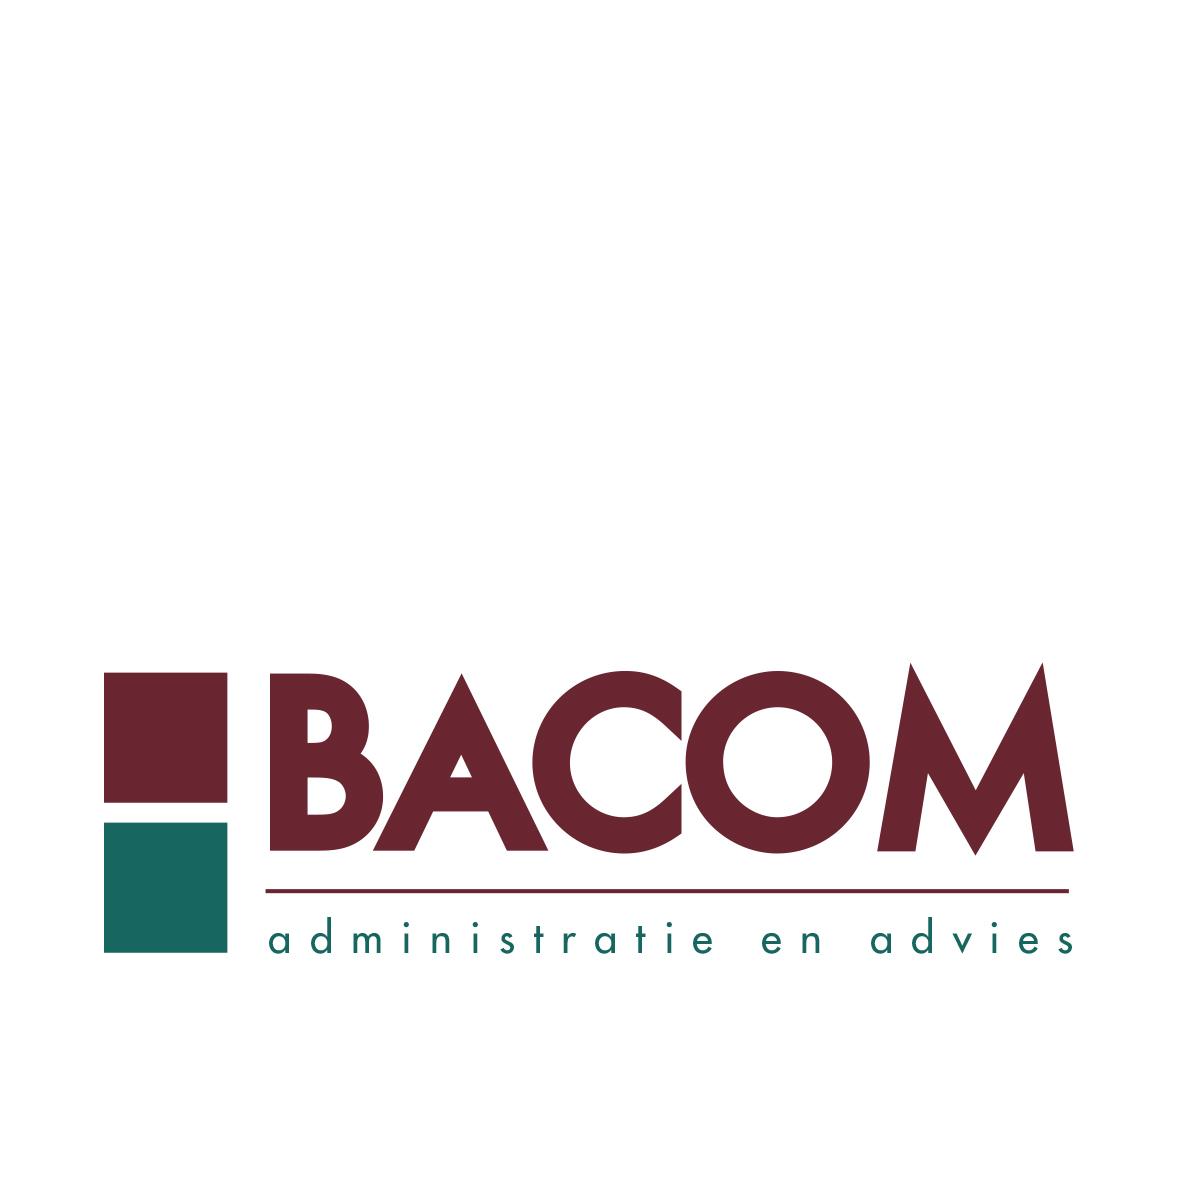 logo BACOM, Amsterdam, 2016